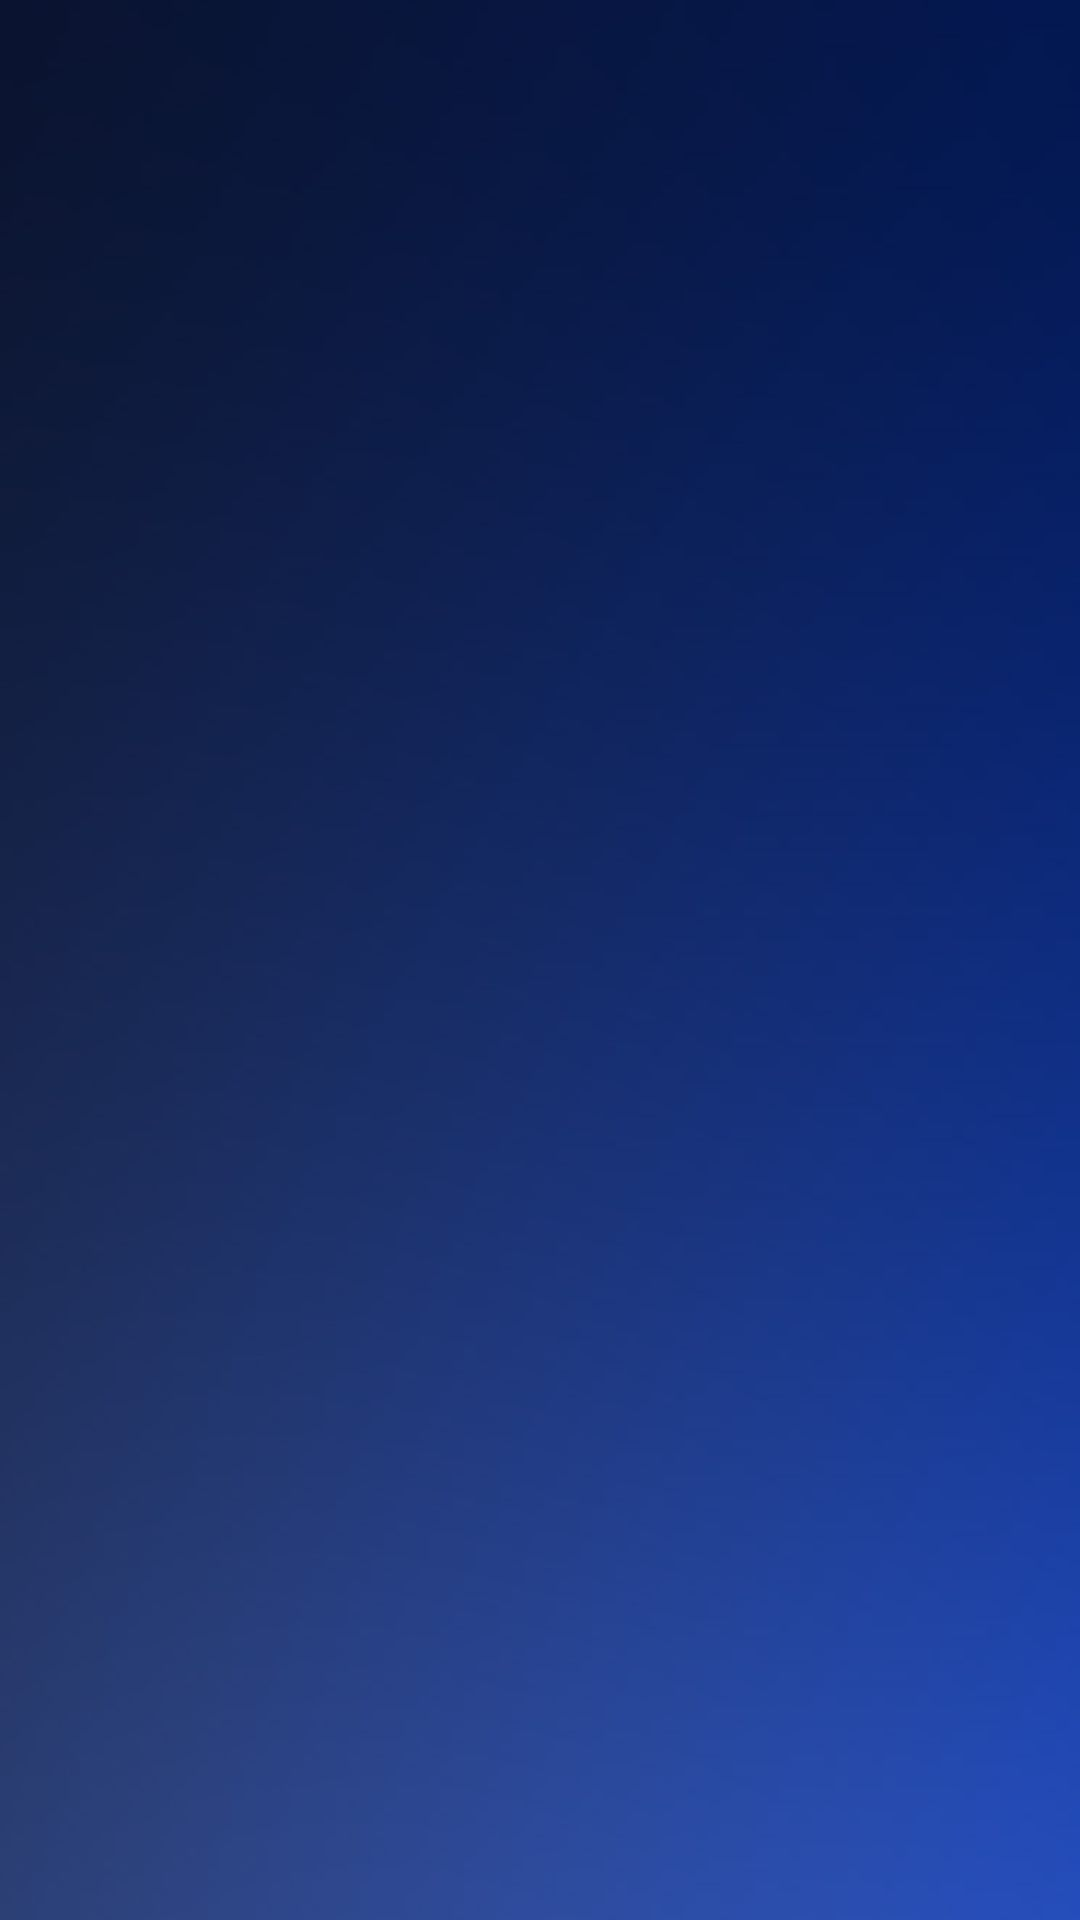 Small Of Navy Blue Wallpaper